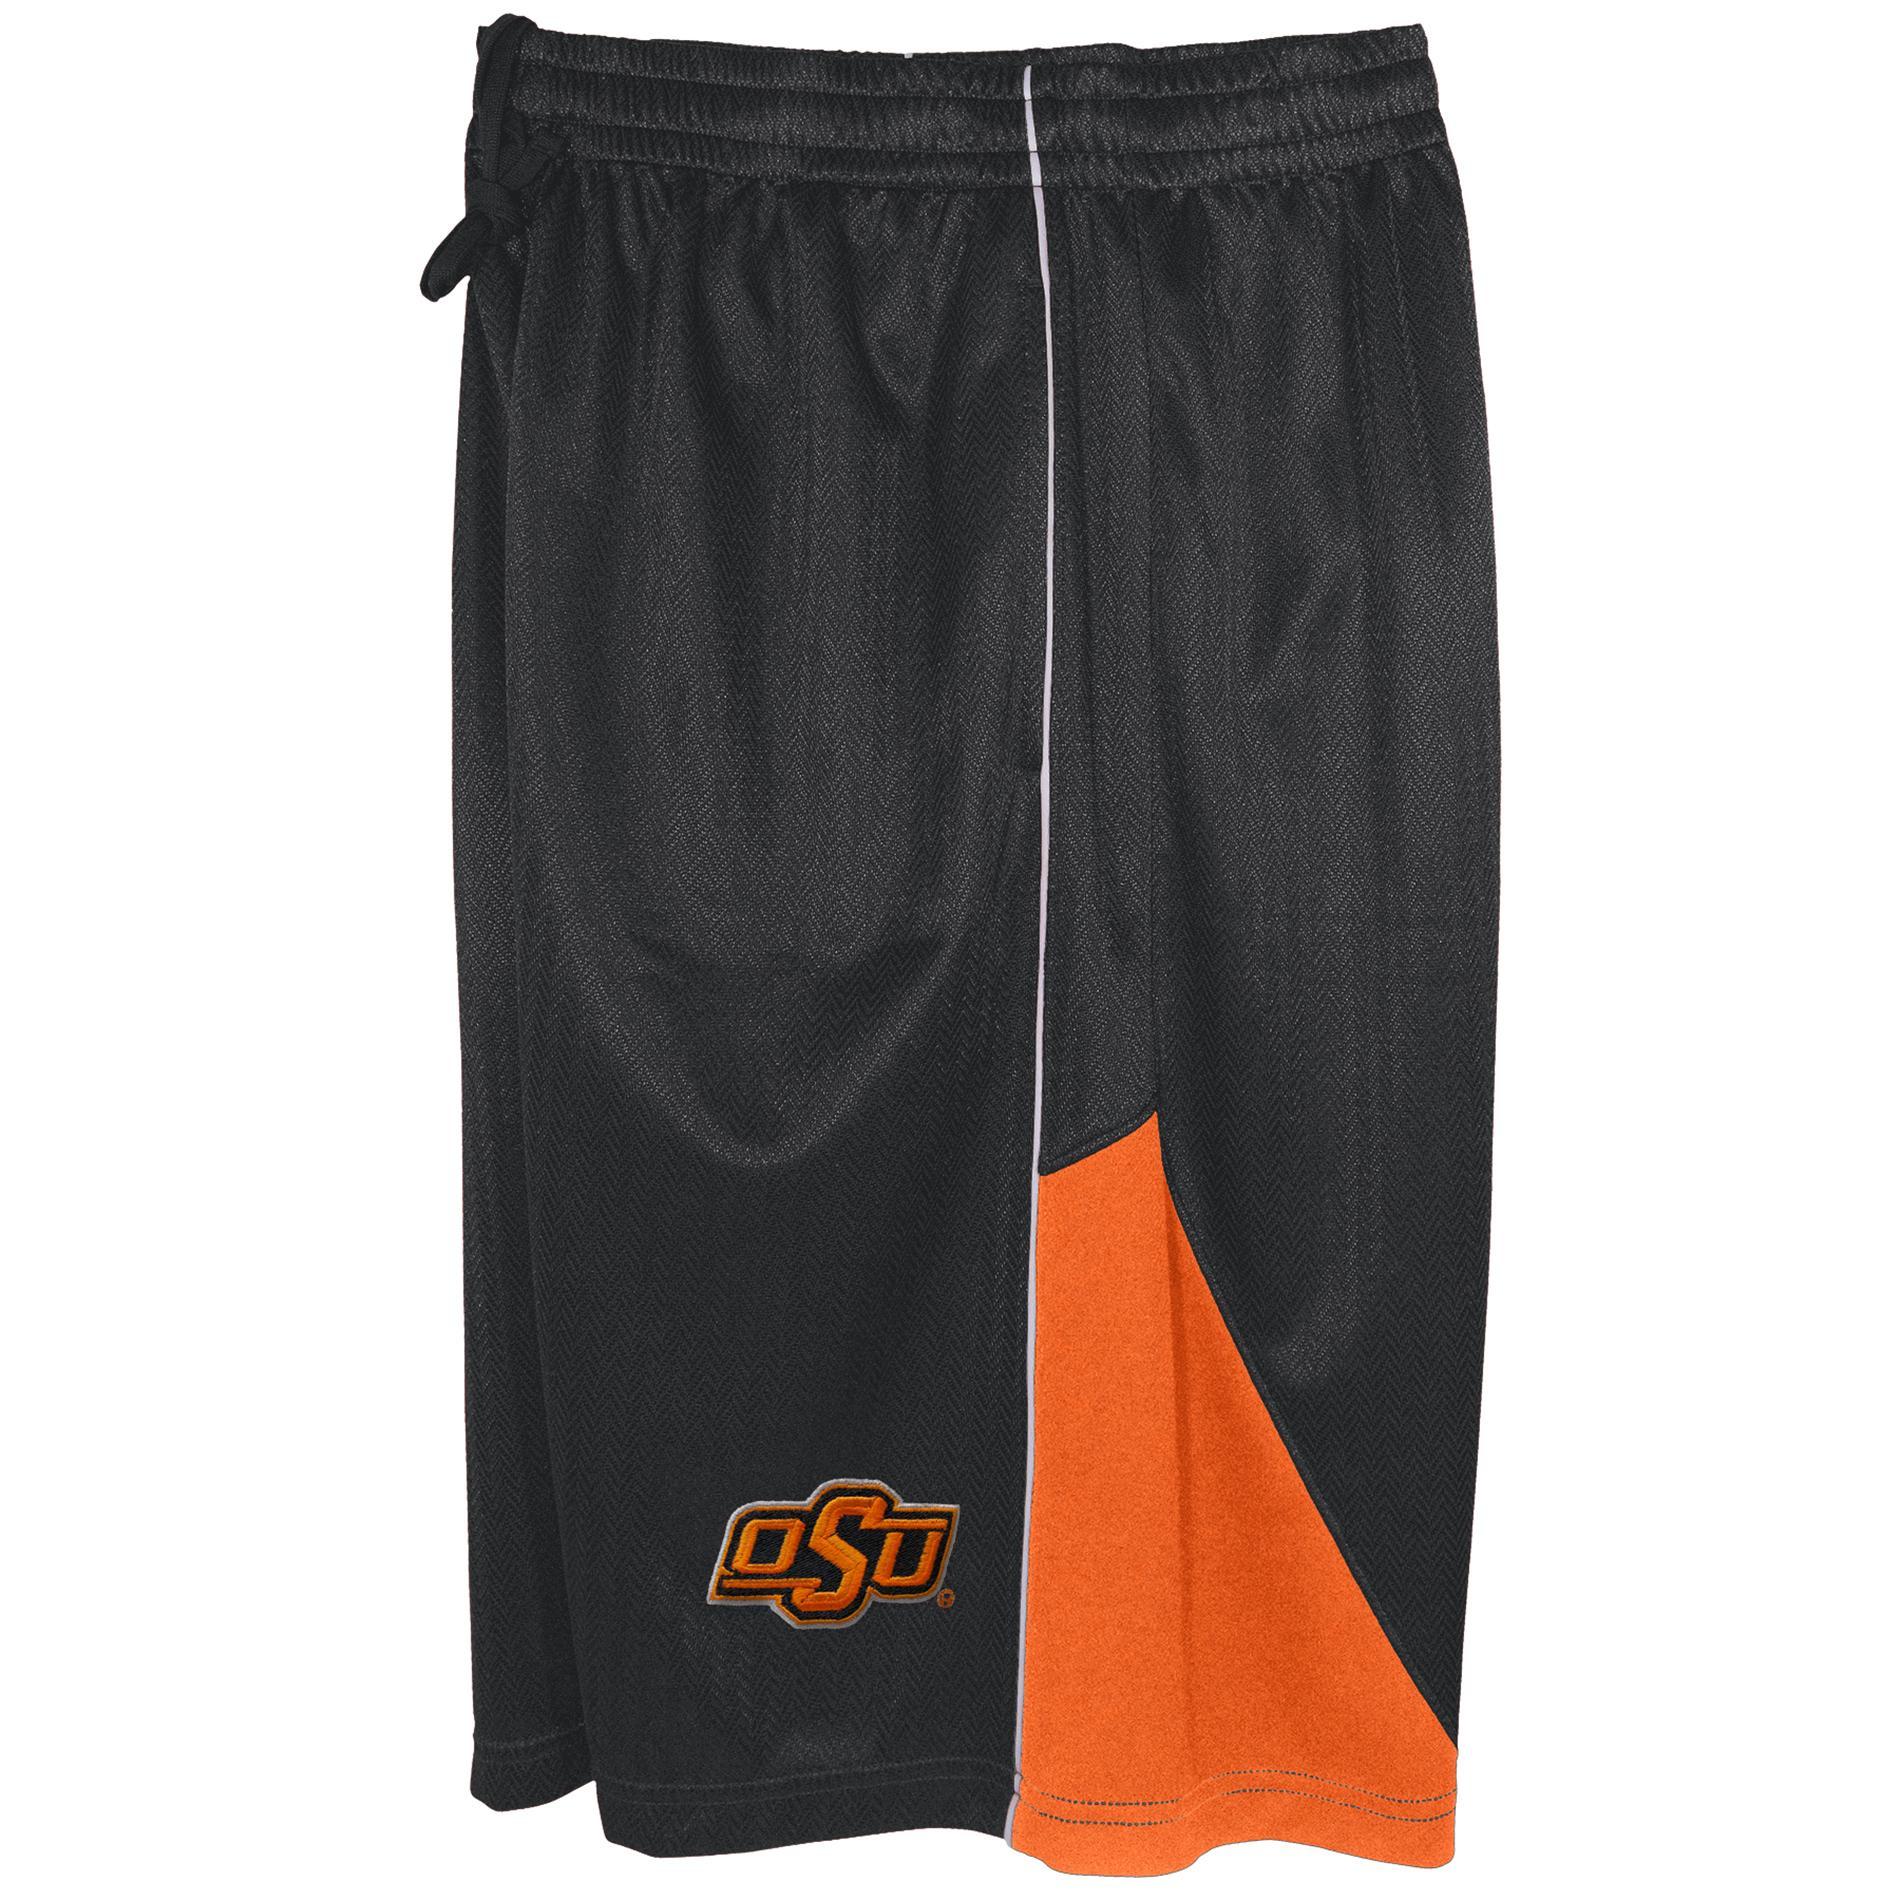 NCAA Men's Basketball Shorts - Oklahoma State University